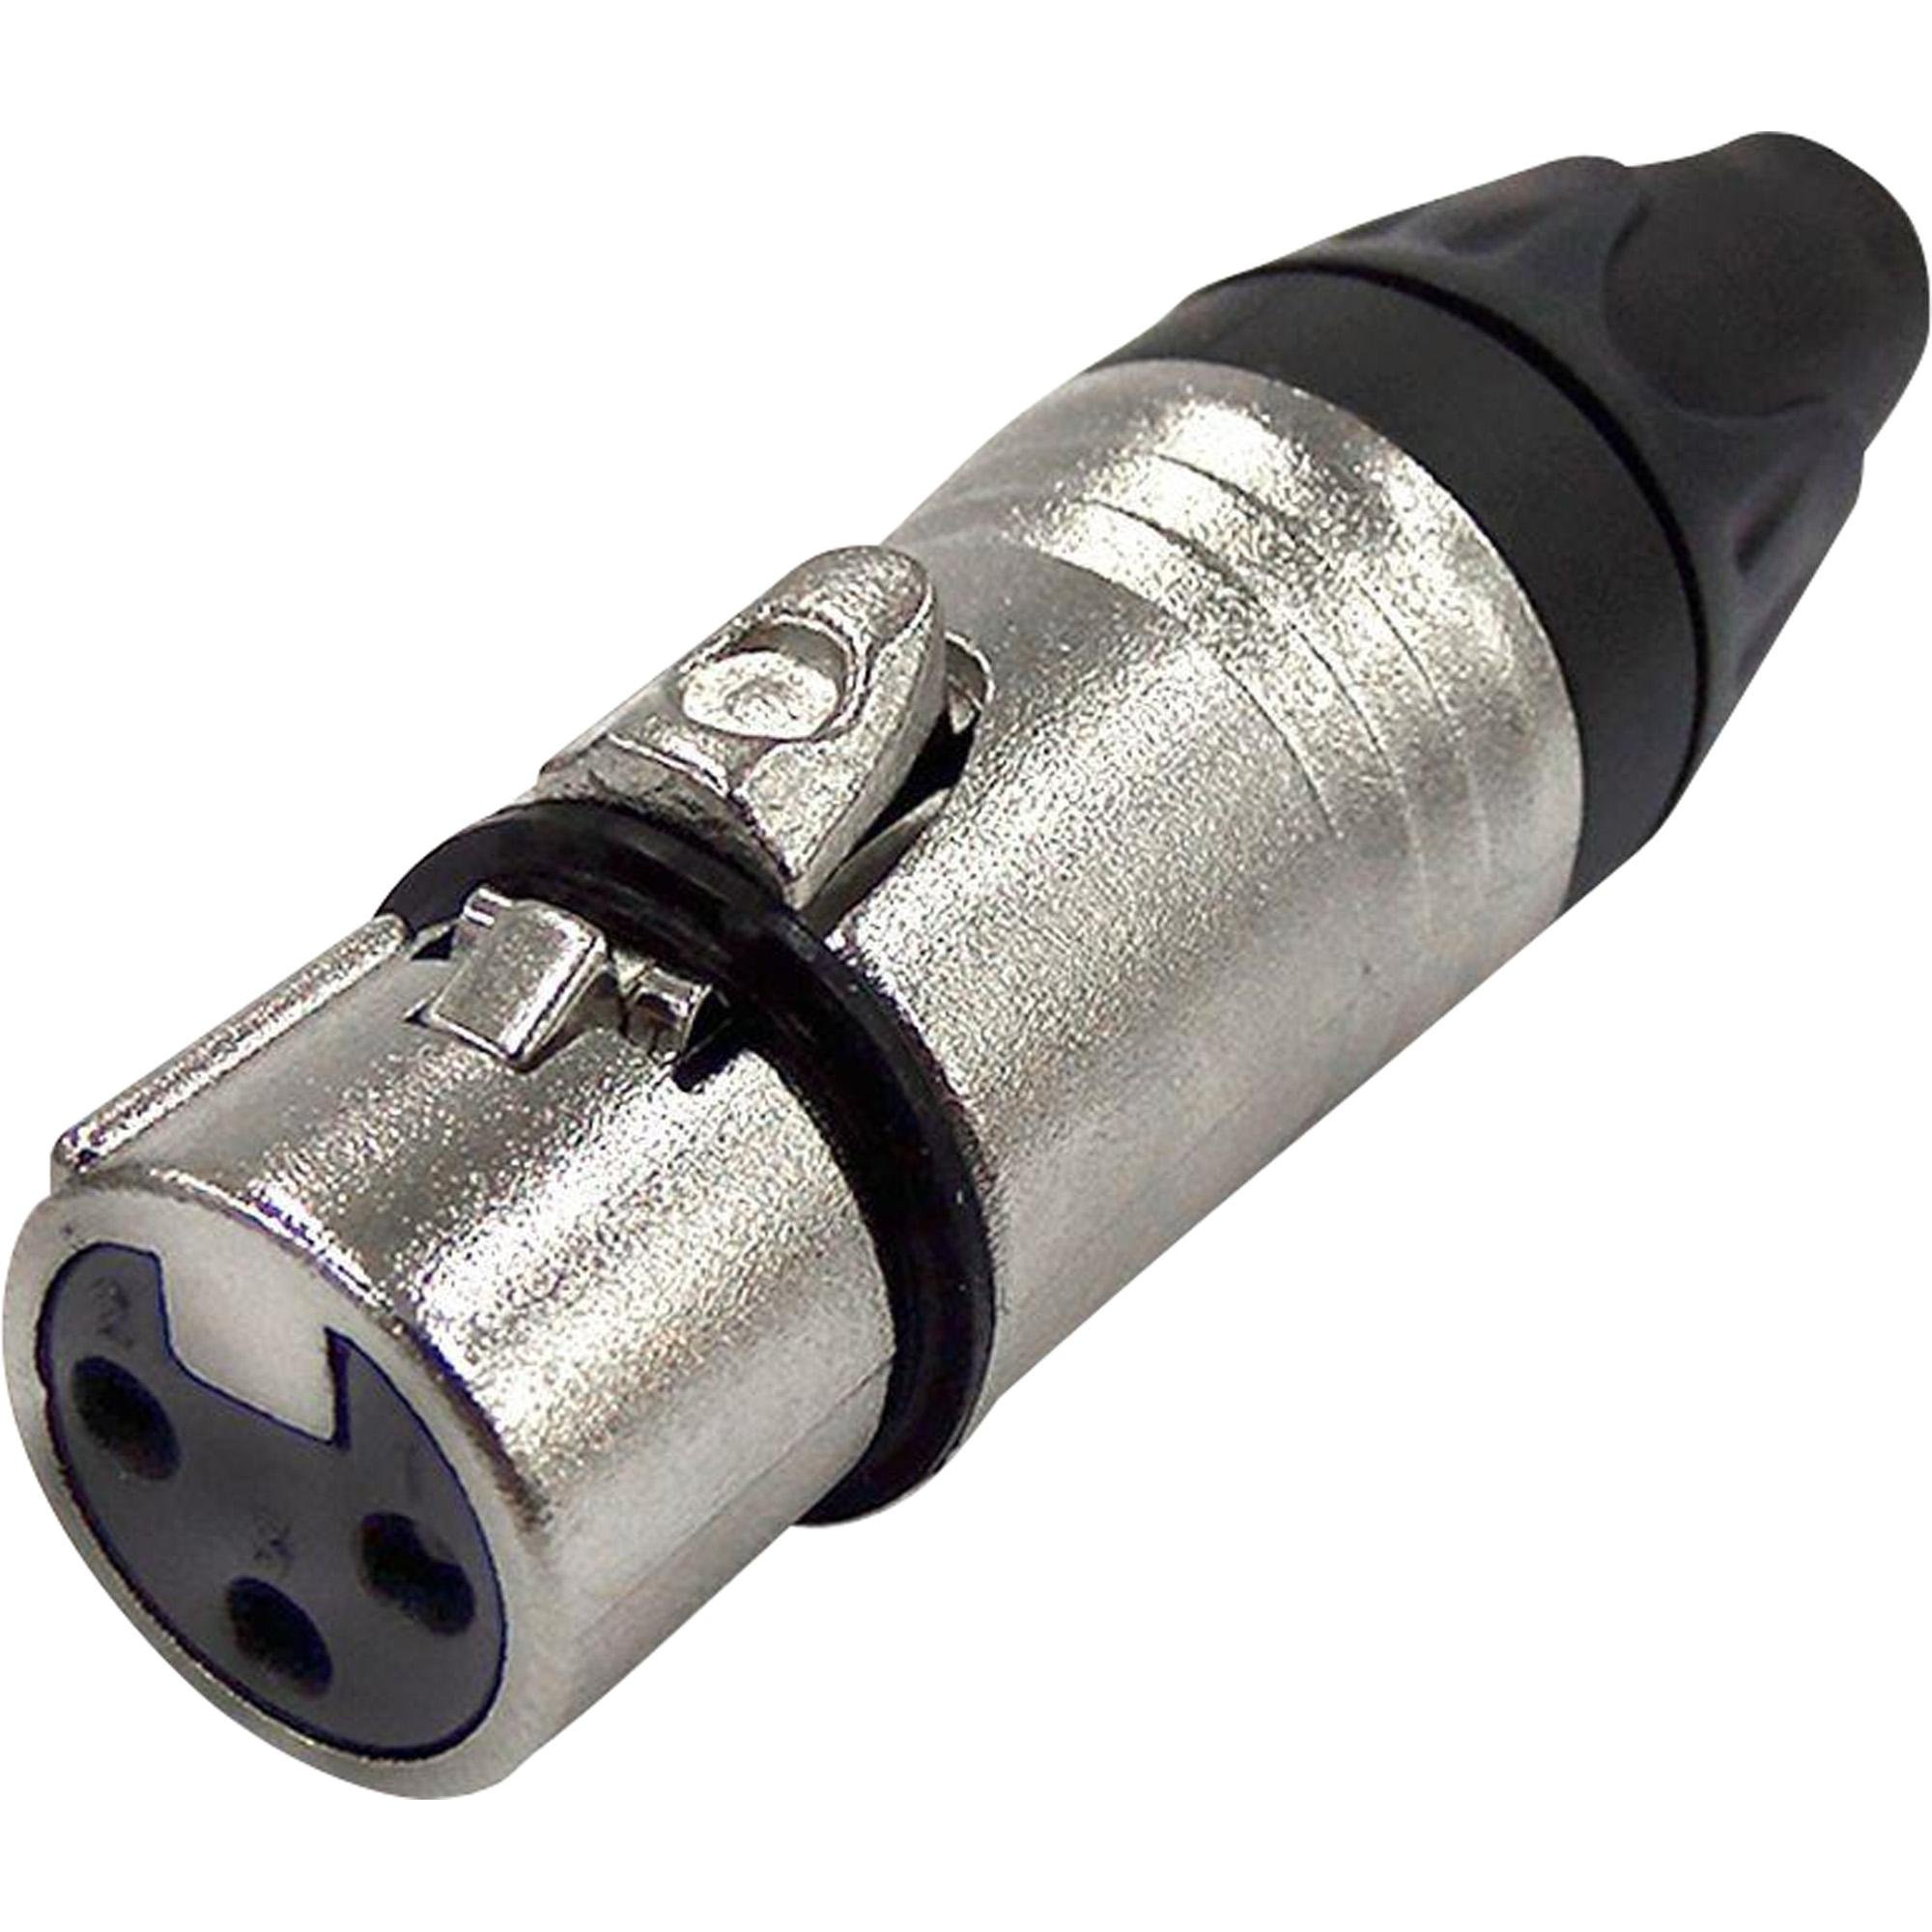 Conector Cannon Fêmea 3 Polos Metal JCCN0017 STORM - PCT / 10